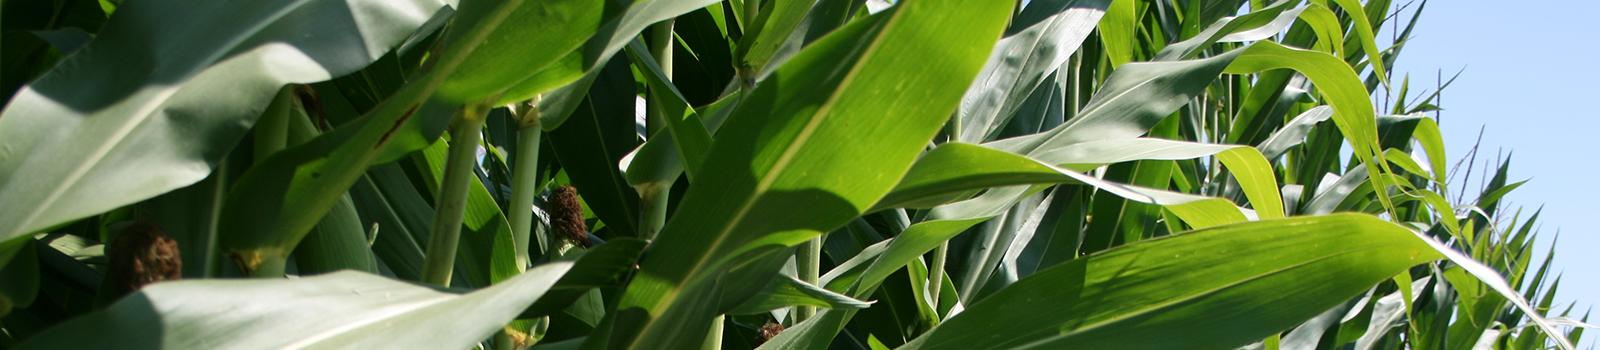 Close up photo of mature corn stalks